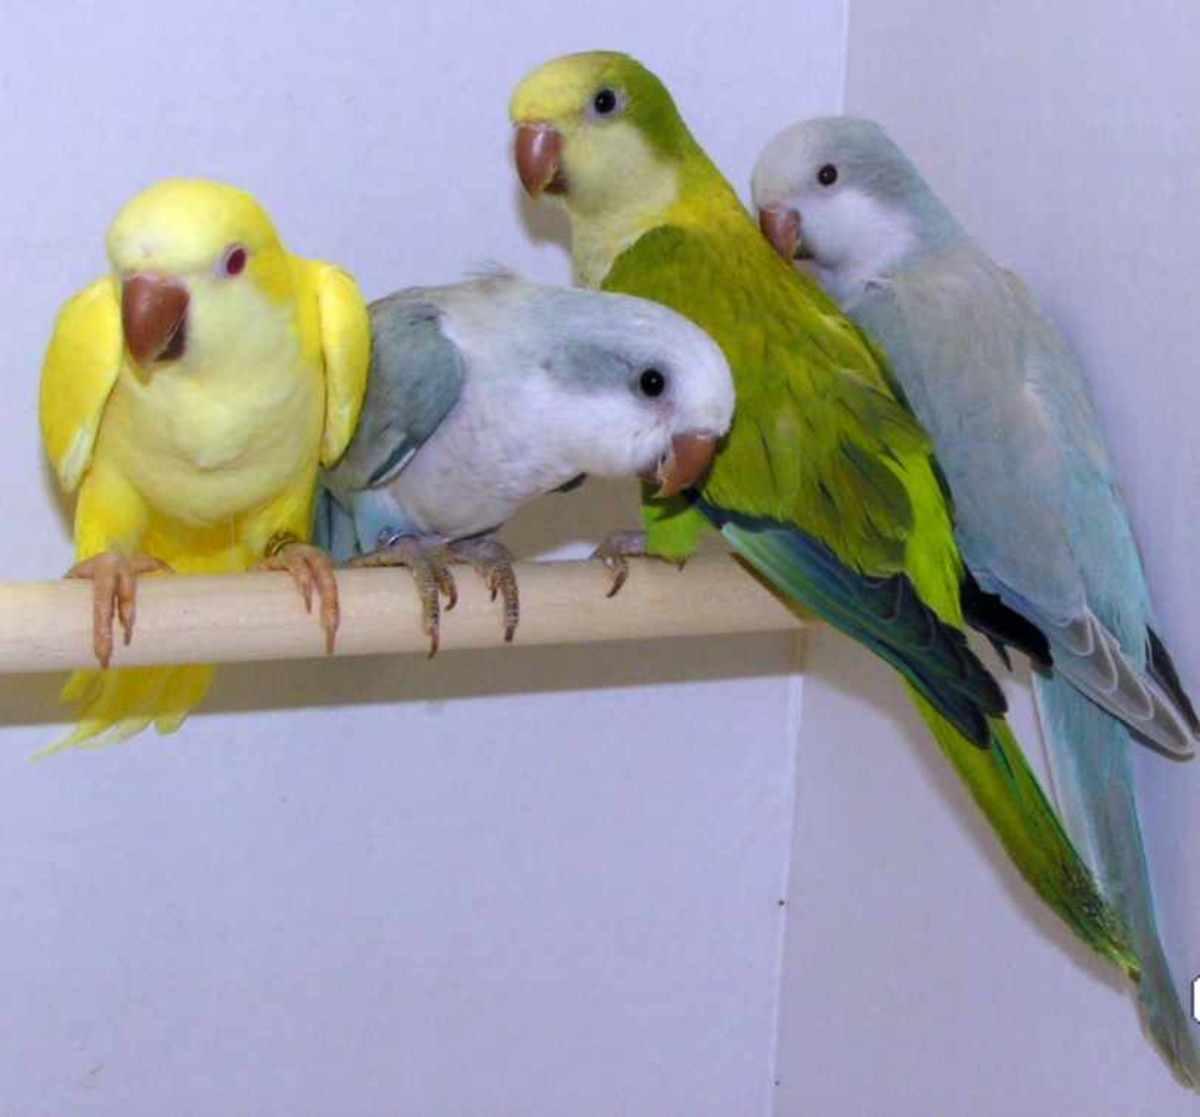 Yellow Albino, Light Blue, Bright Green